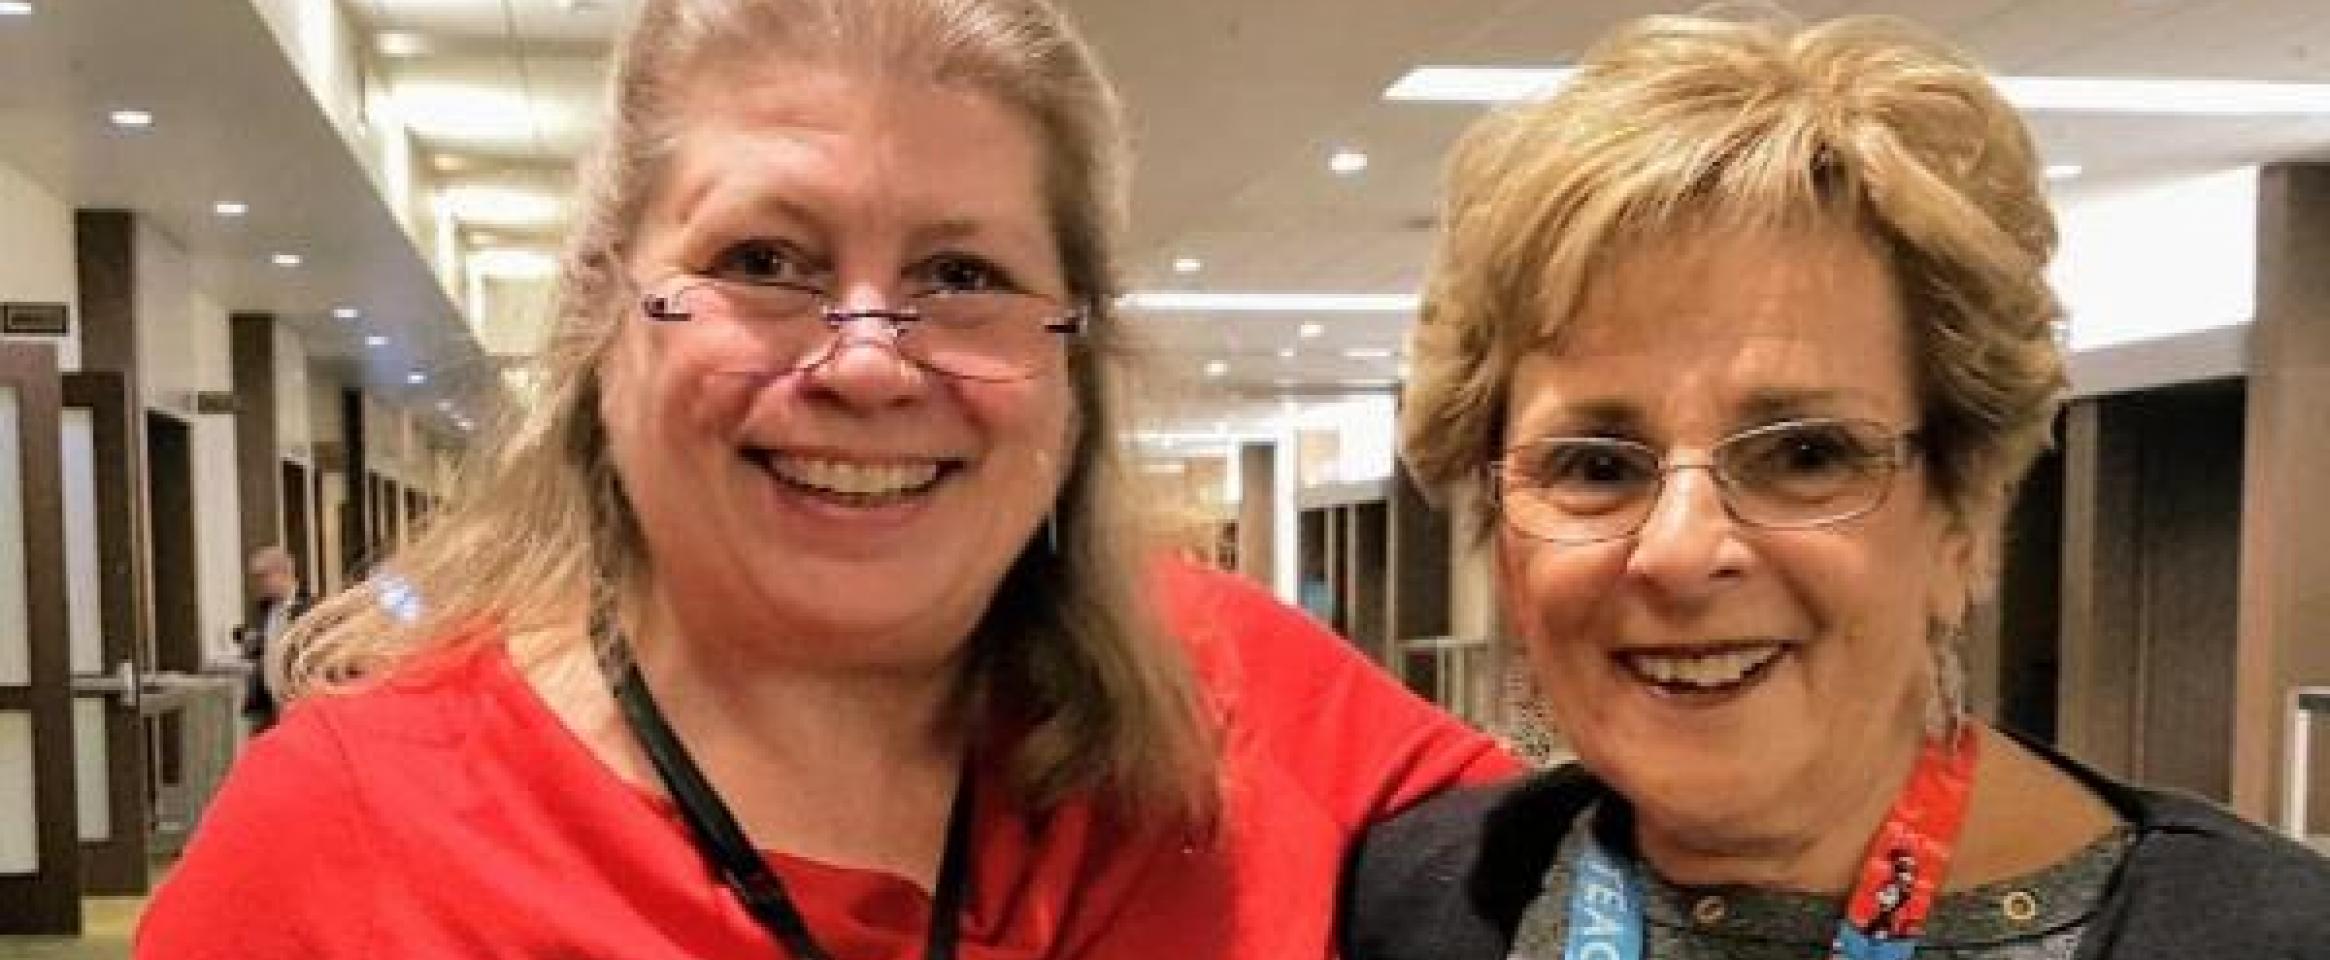 Jennifer Cox and Diane McGurgan